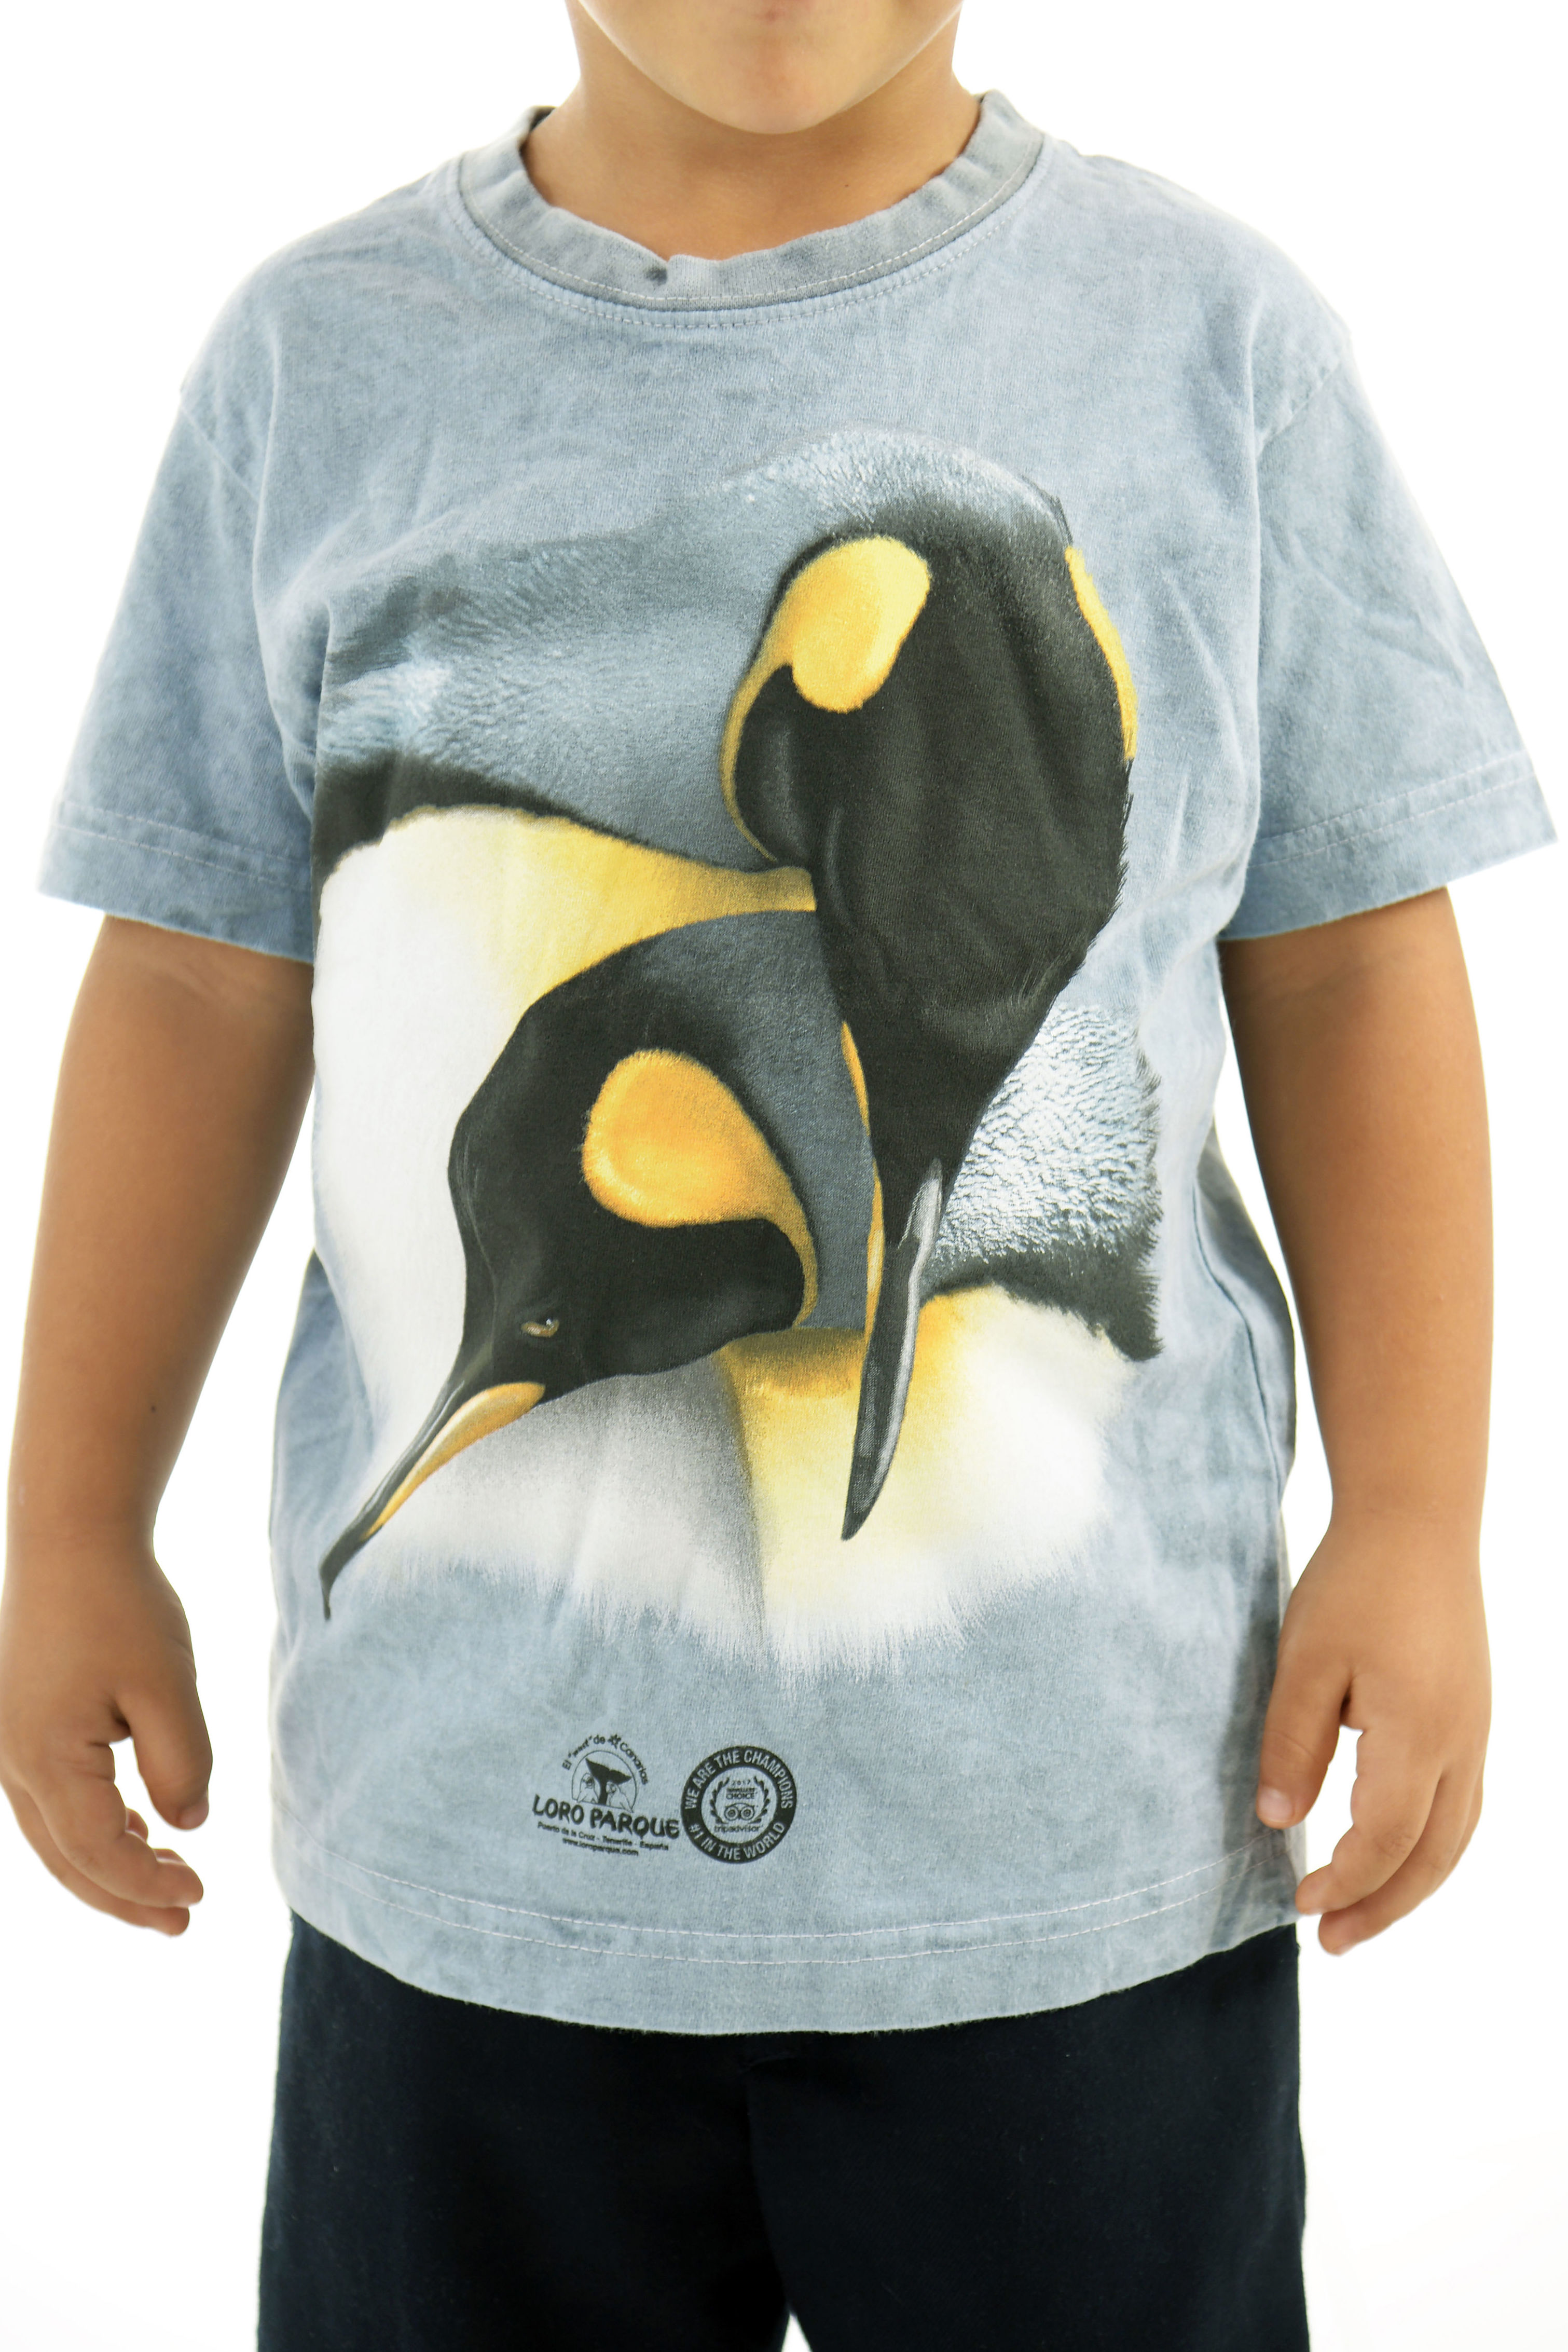 Camiseta Niñ@ 2 Pingüinos / 2 Penguins Child´s T-Shirt: Productos de BELLA TRADICION